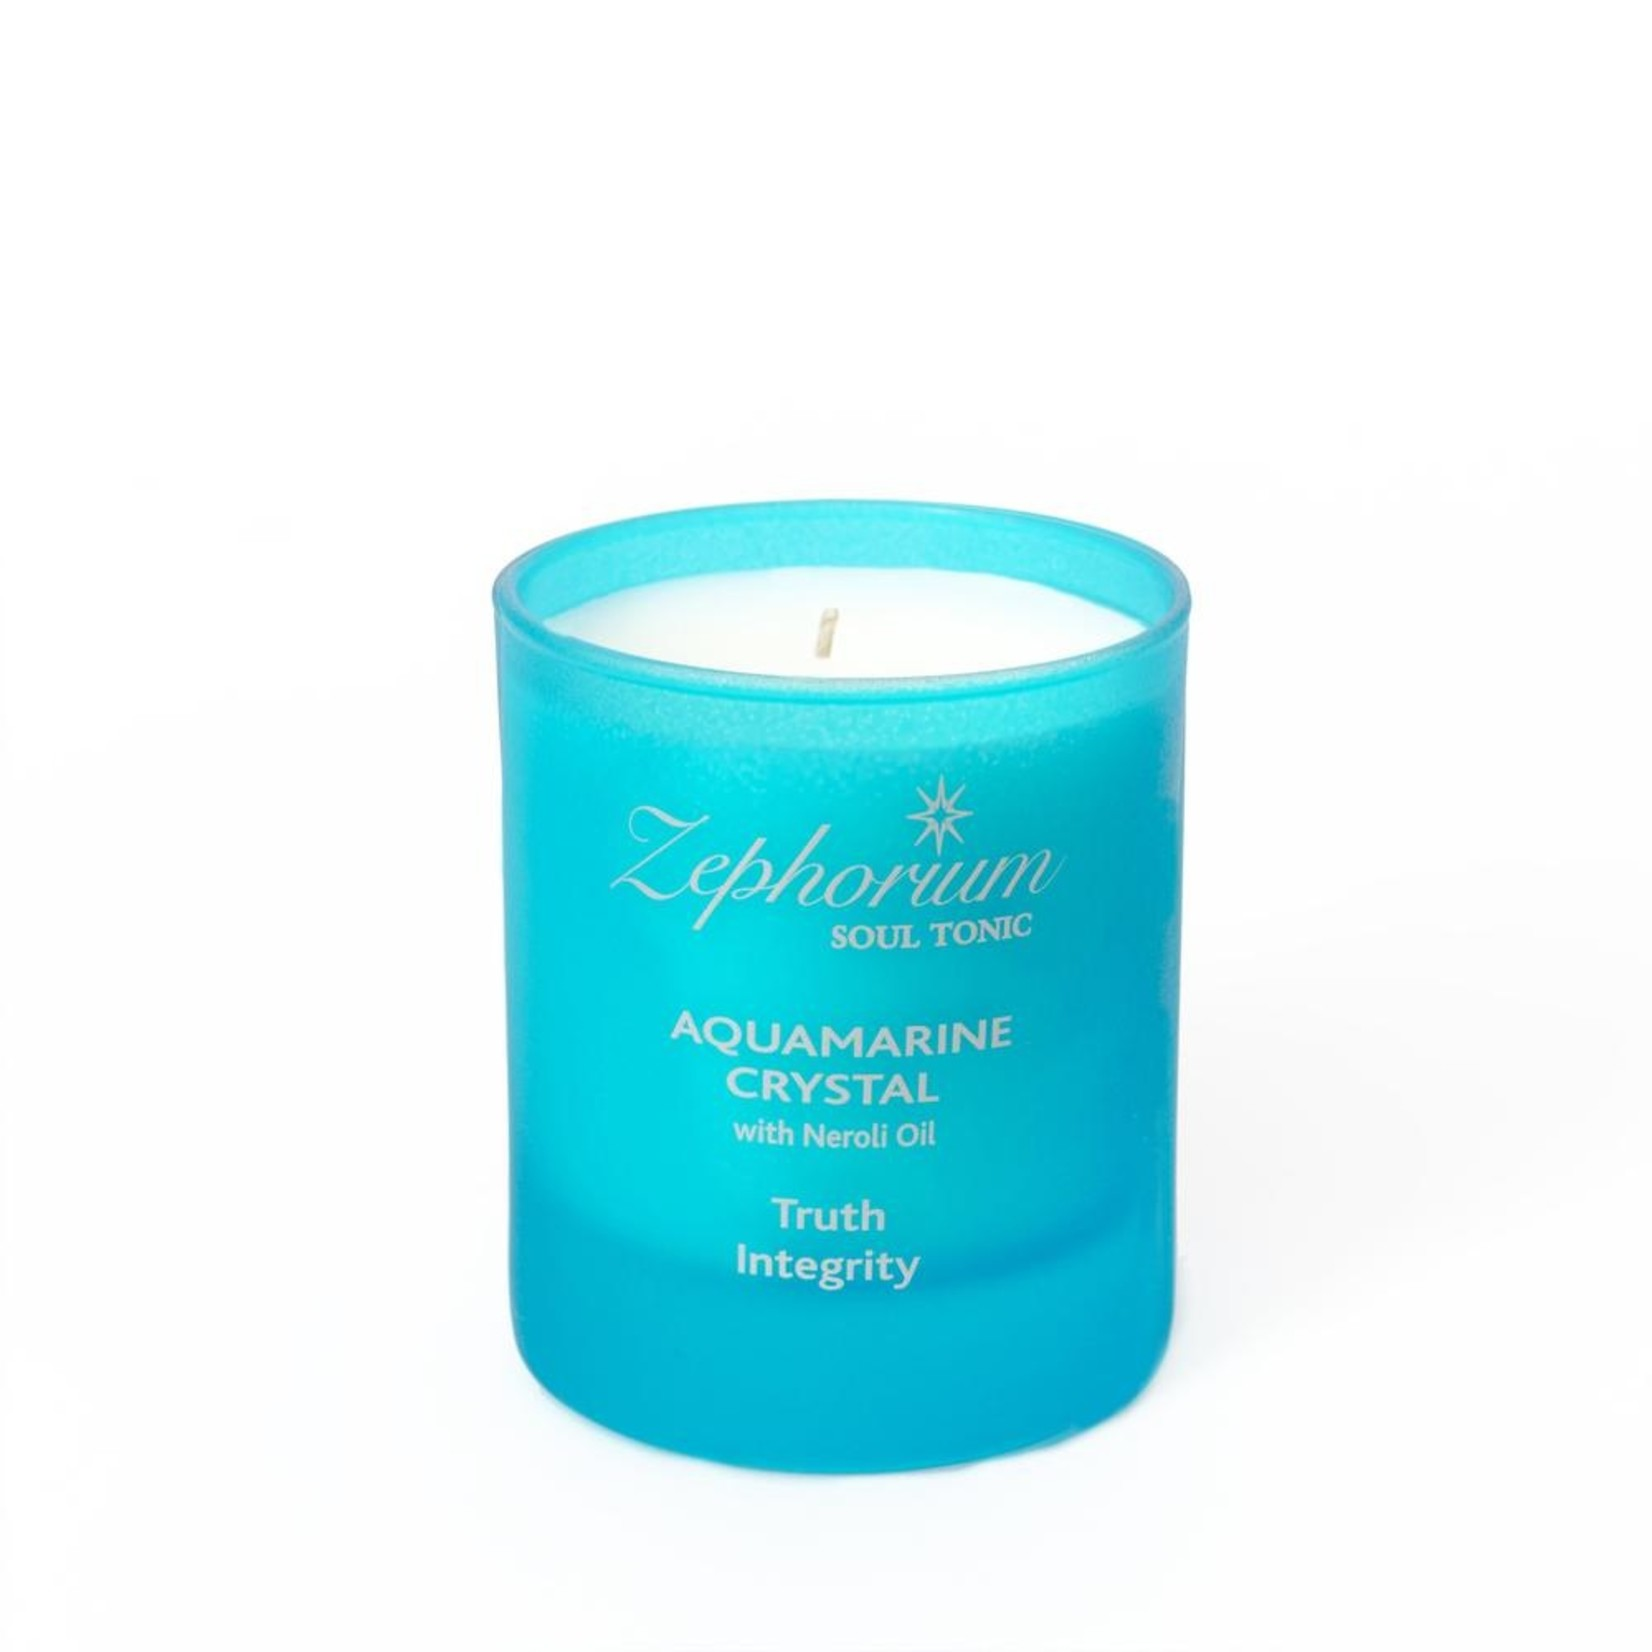 Zephorium Aquamarine aromatherapiekaars Zephorium - keelchakra